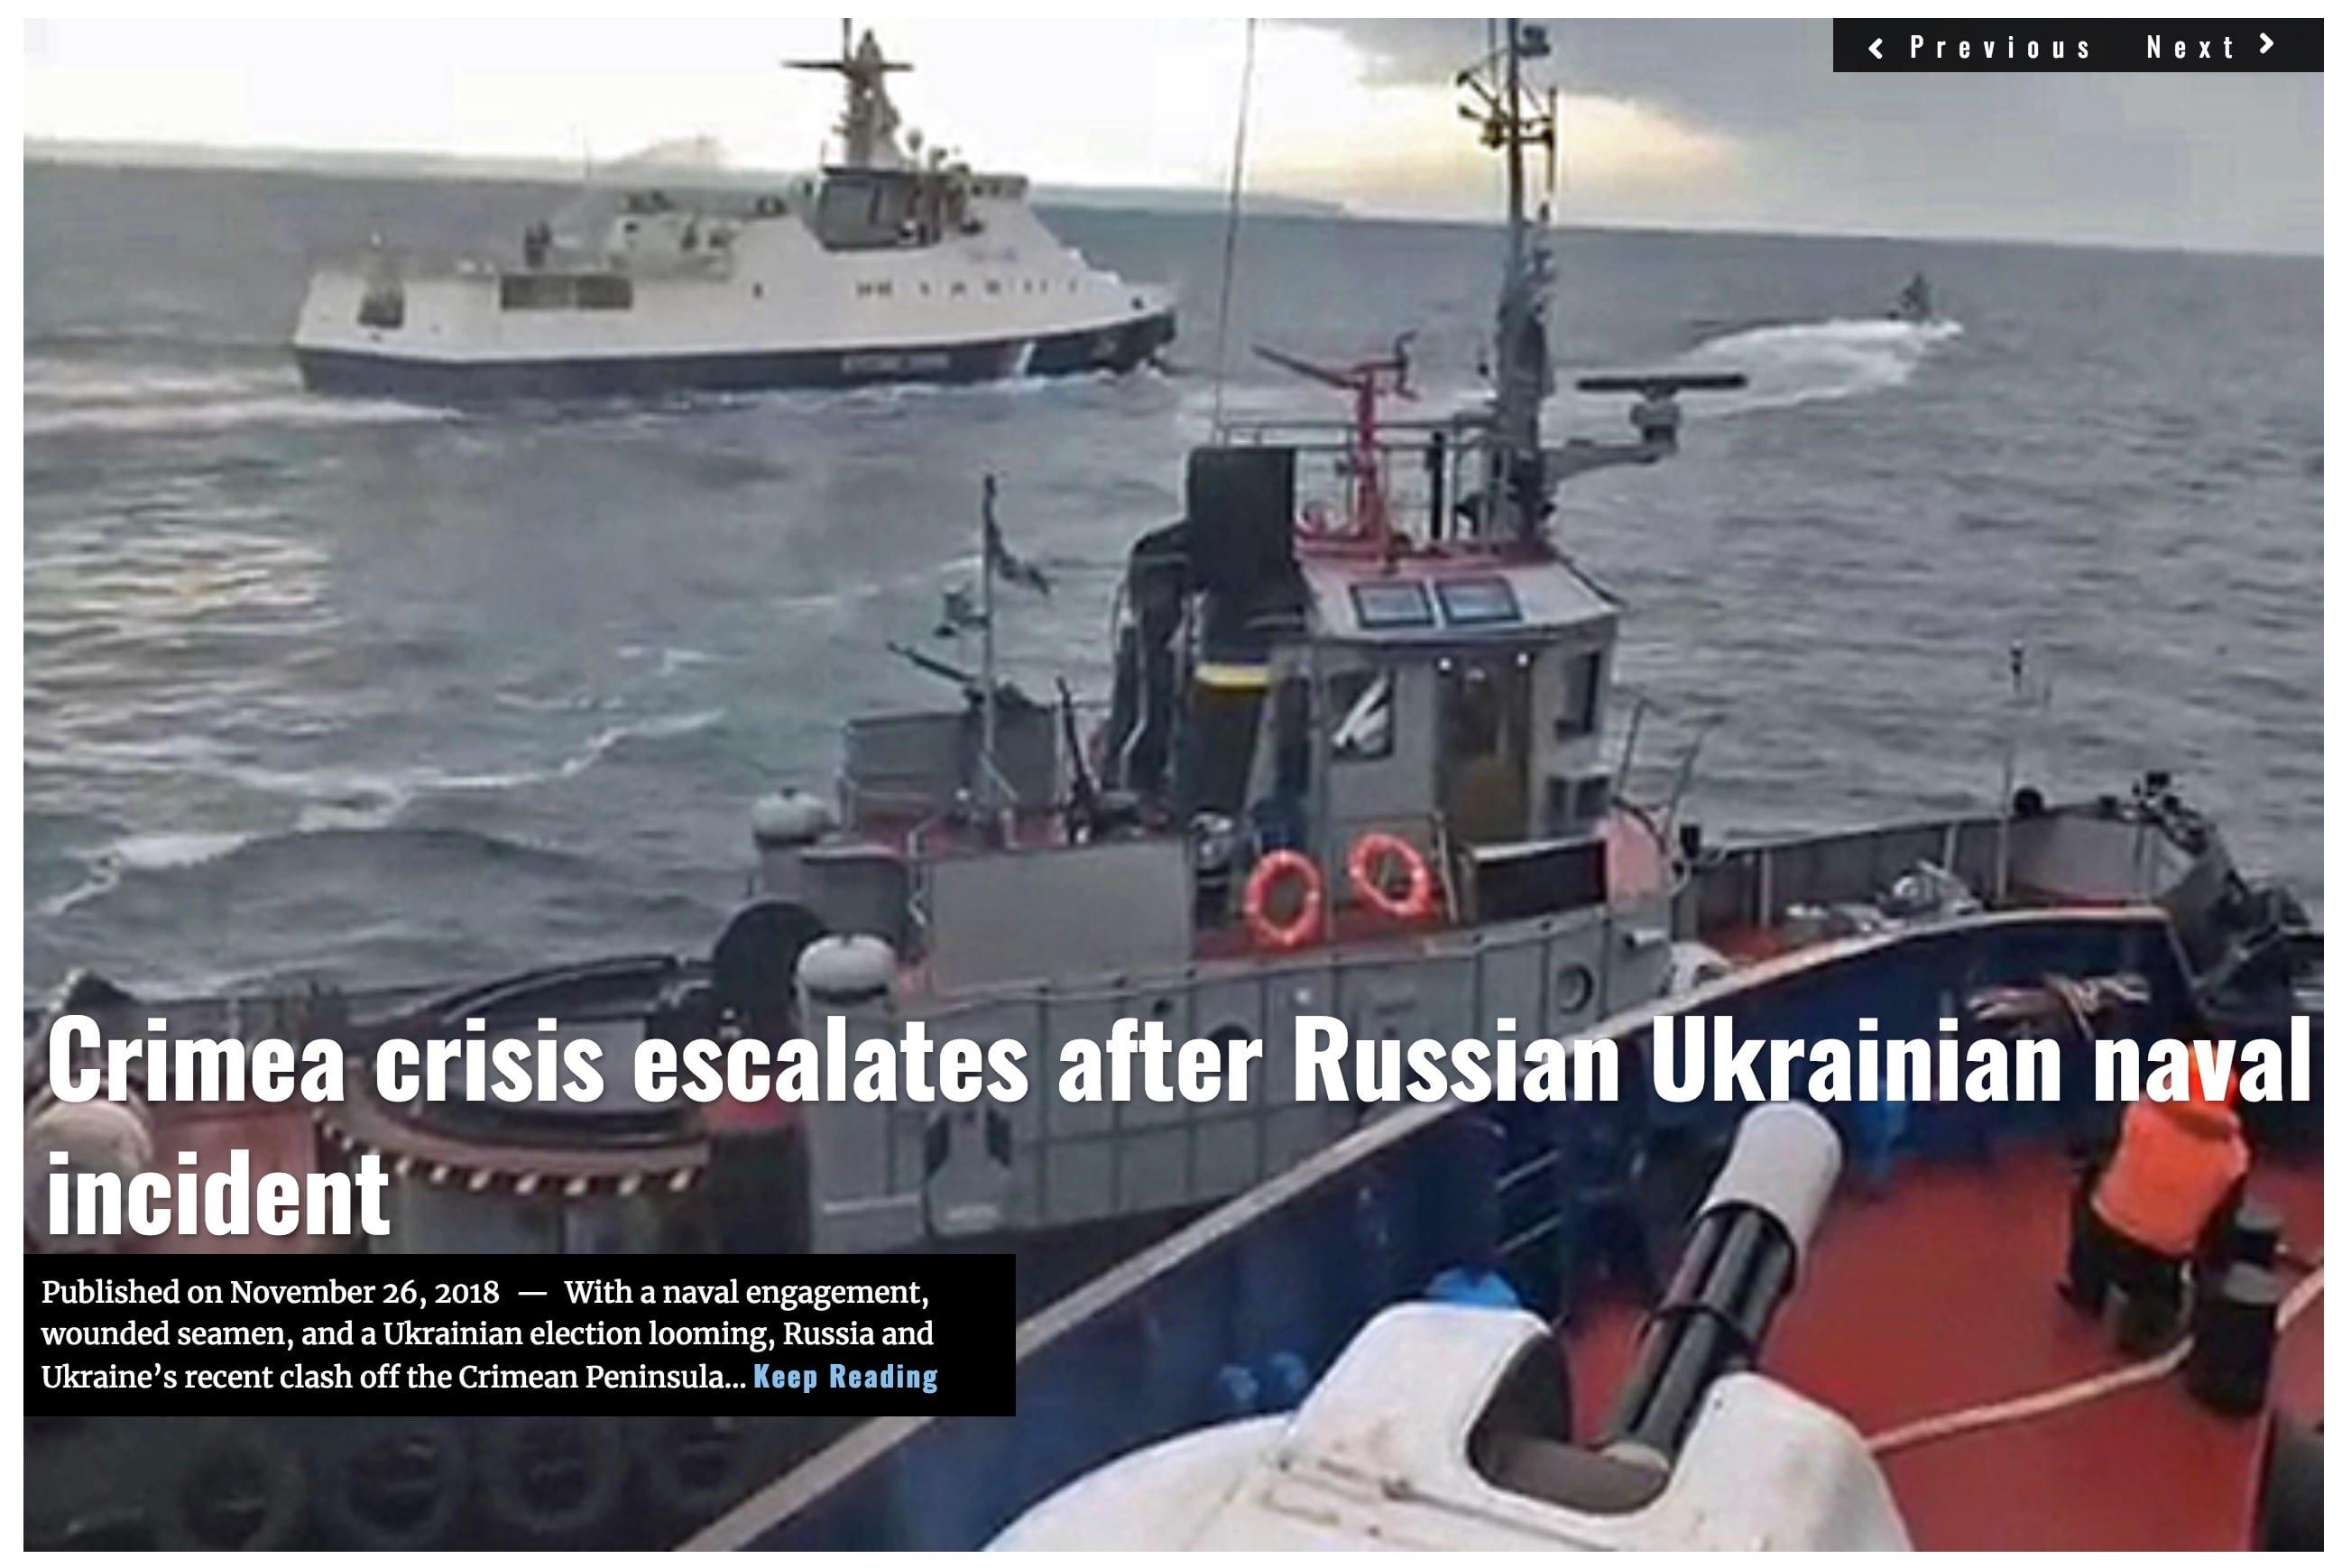 Image Lima Charlie News Headline Crimea Crisis Escalates NOV 26 2018